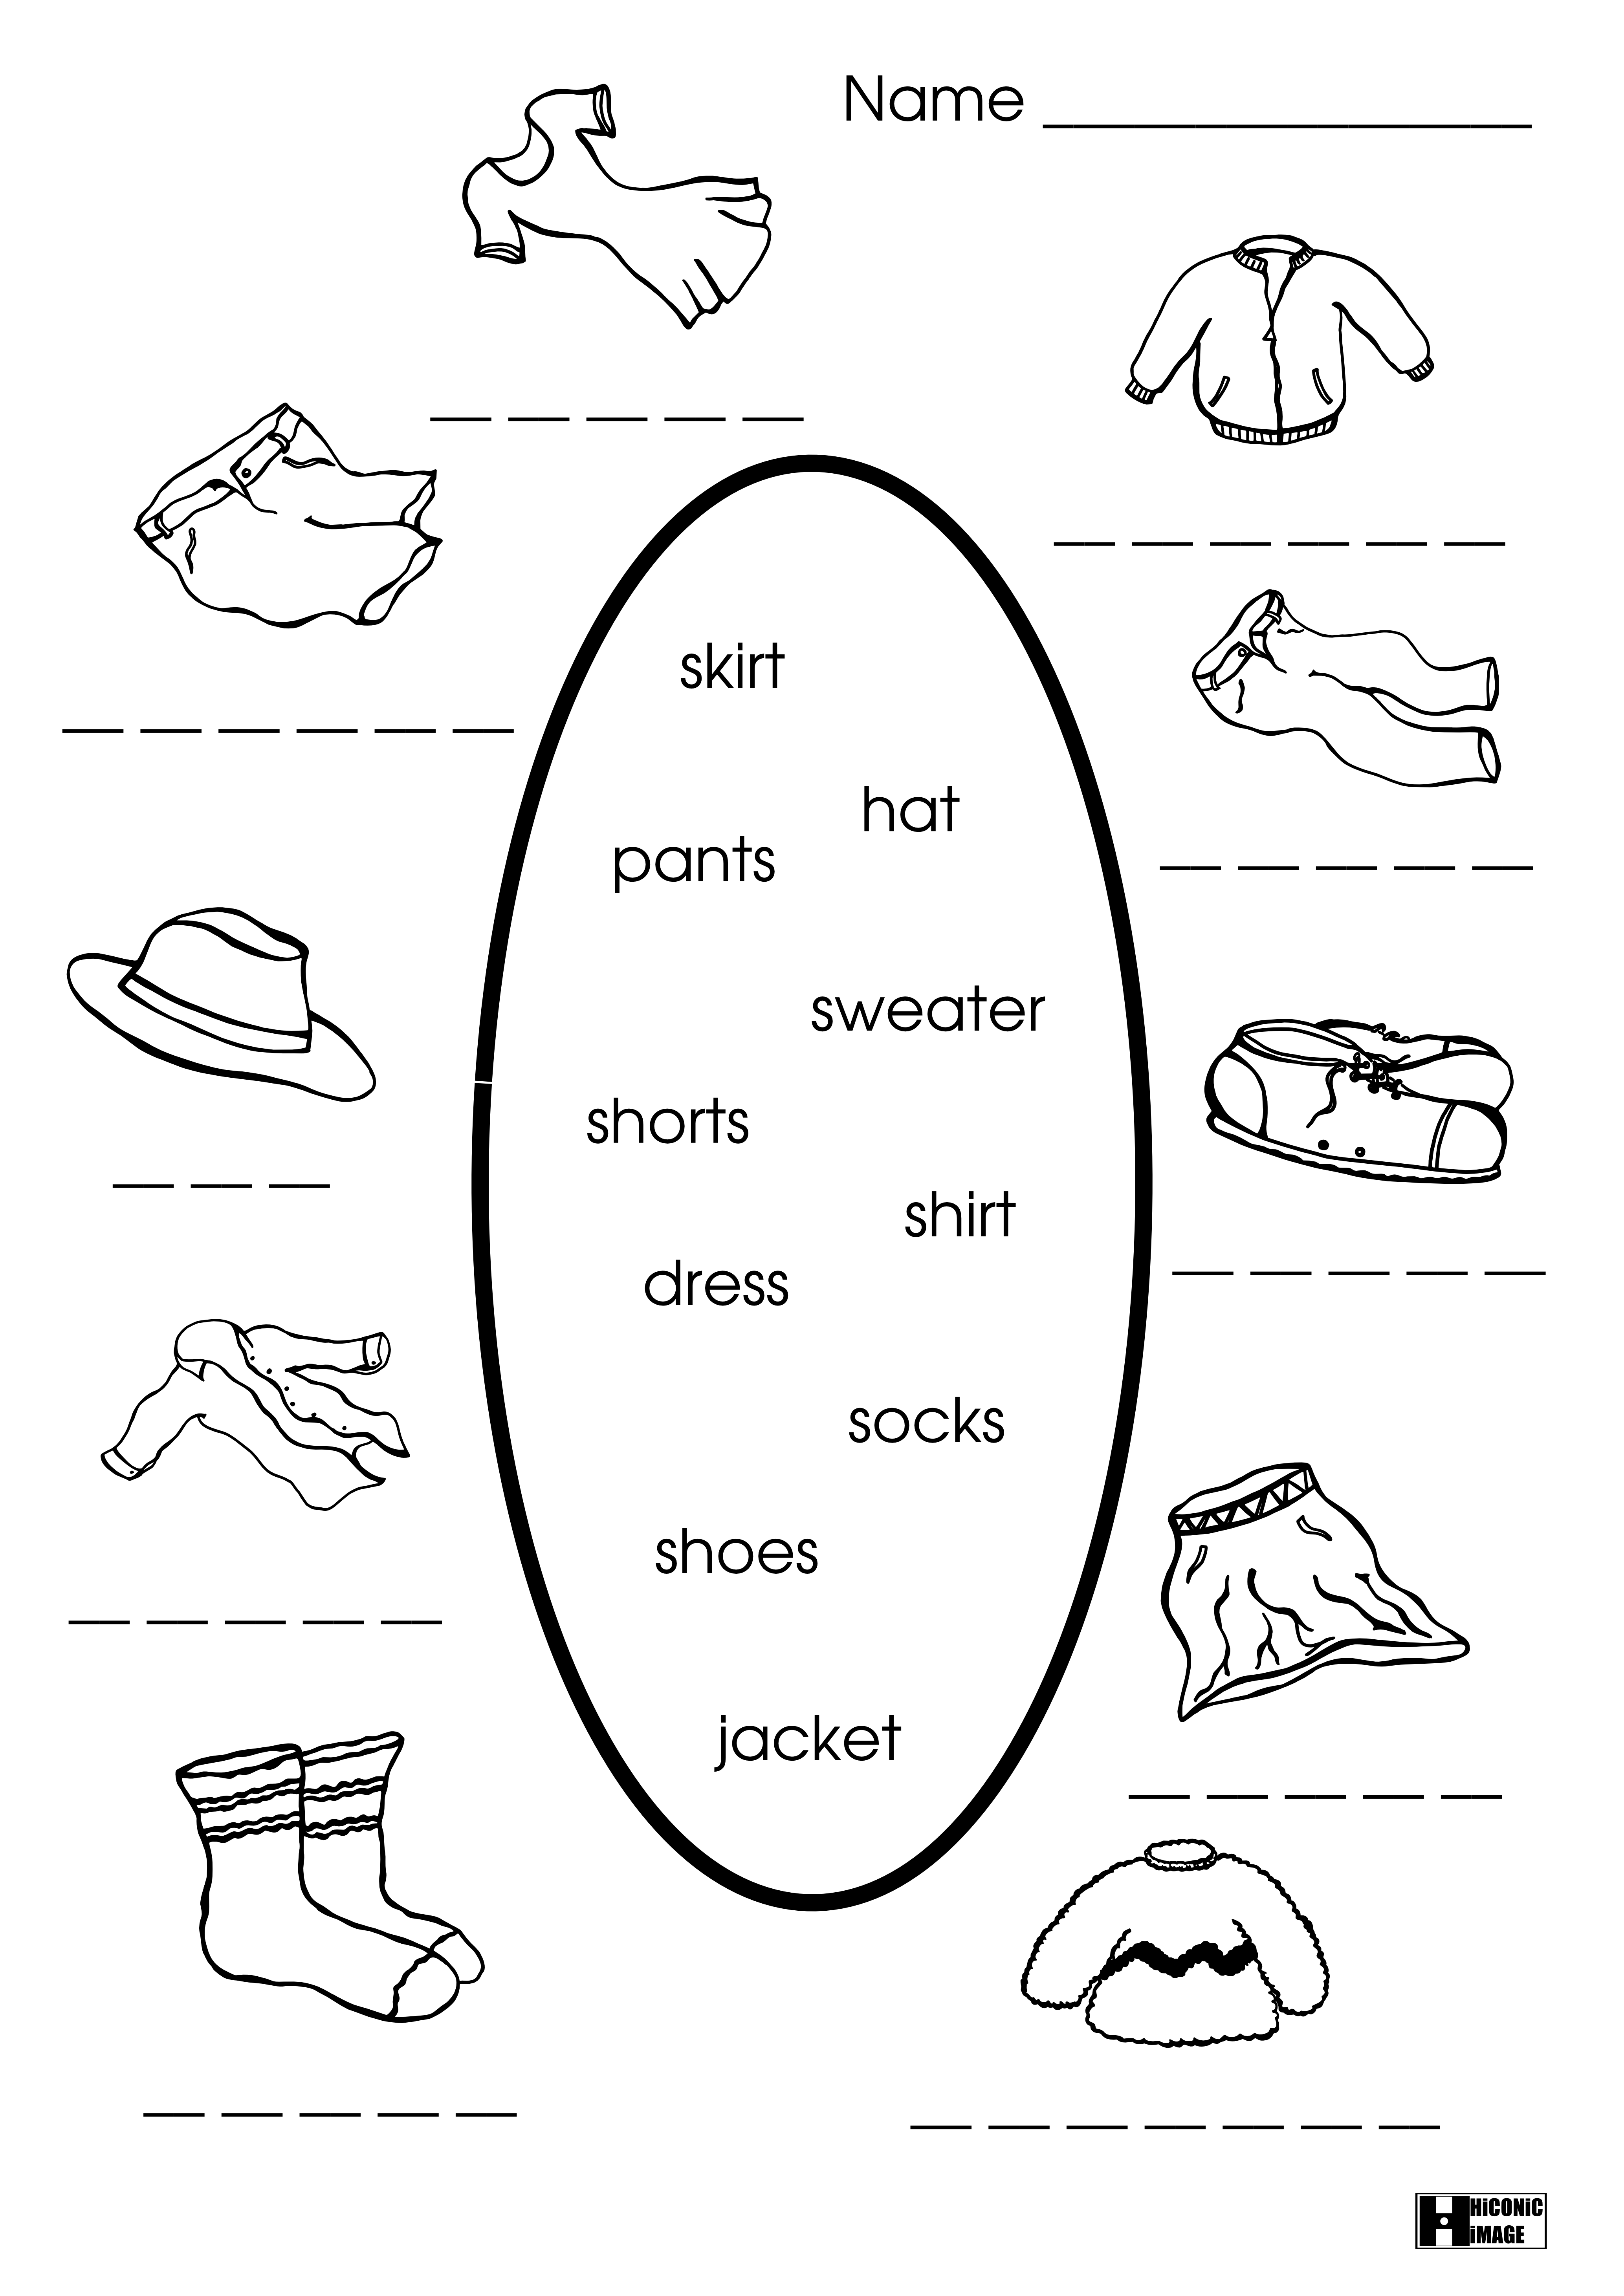 worksheet Spanish Vocabulary Worksheets spanish clothes worksheet  vocabulary pinterest works…   Learning english for kids [ 5846 x 4134 Pixel ]